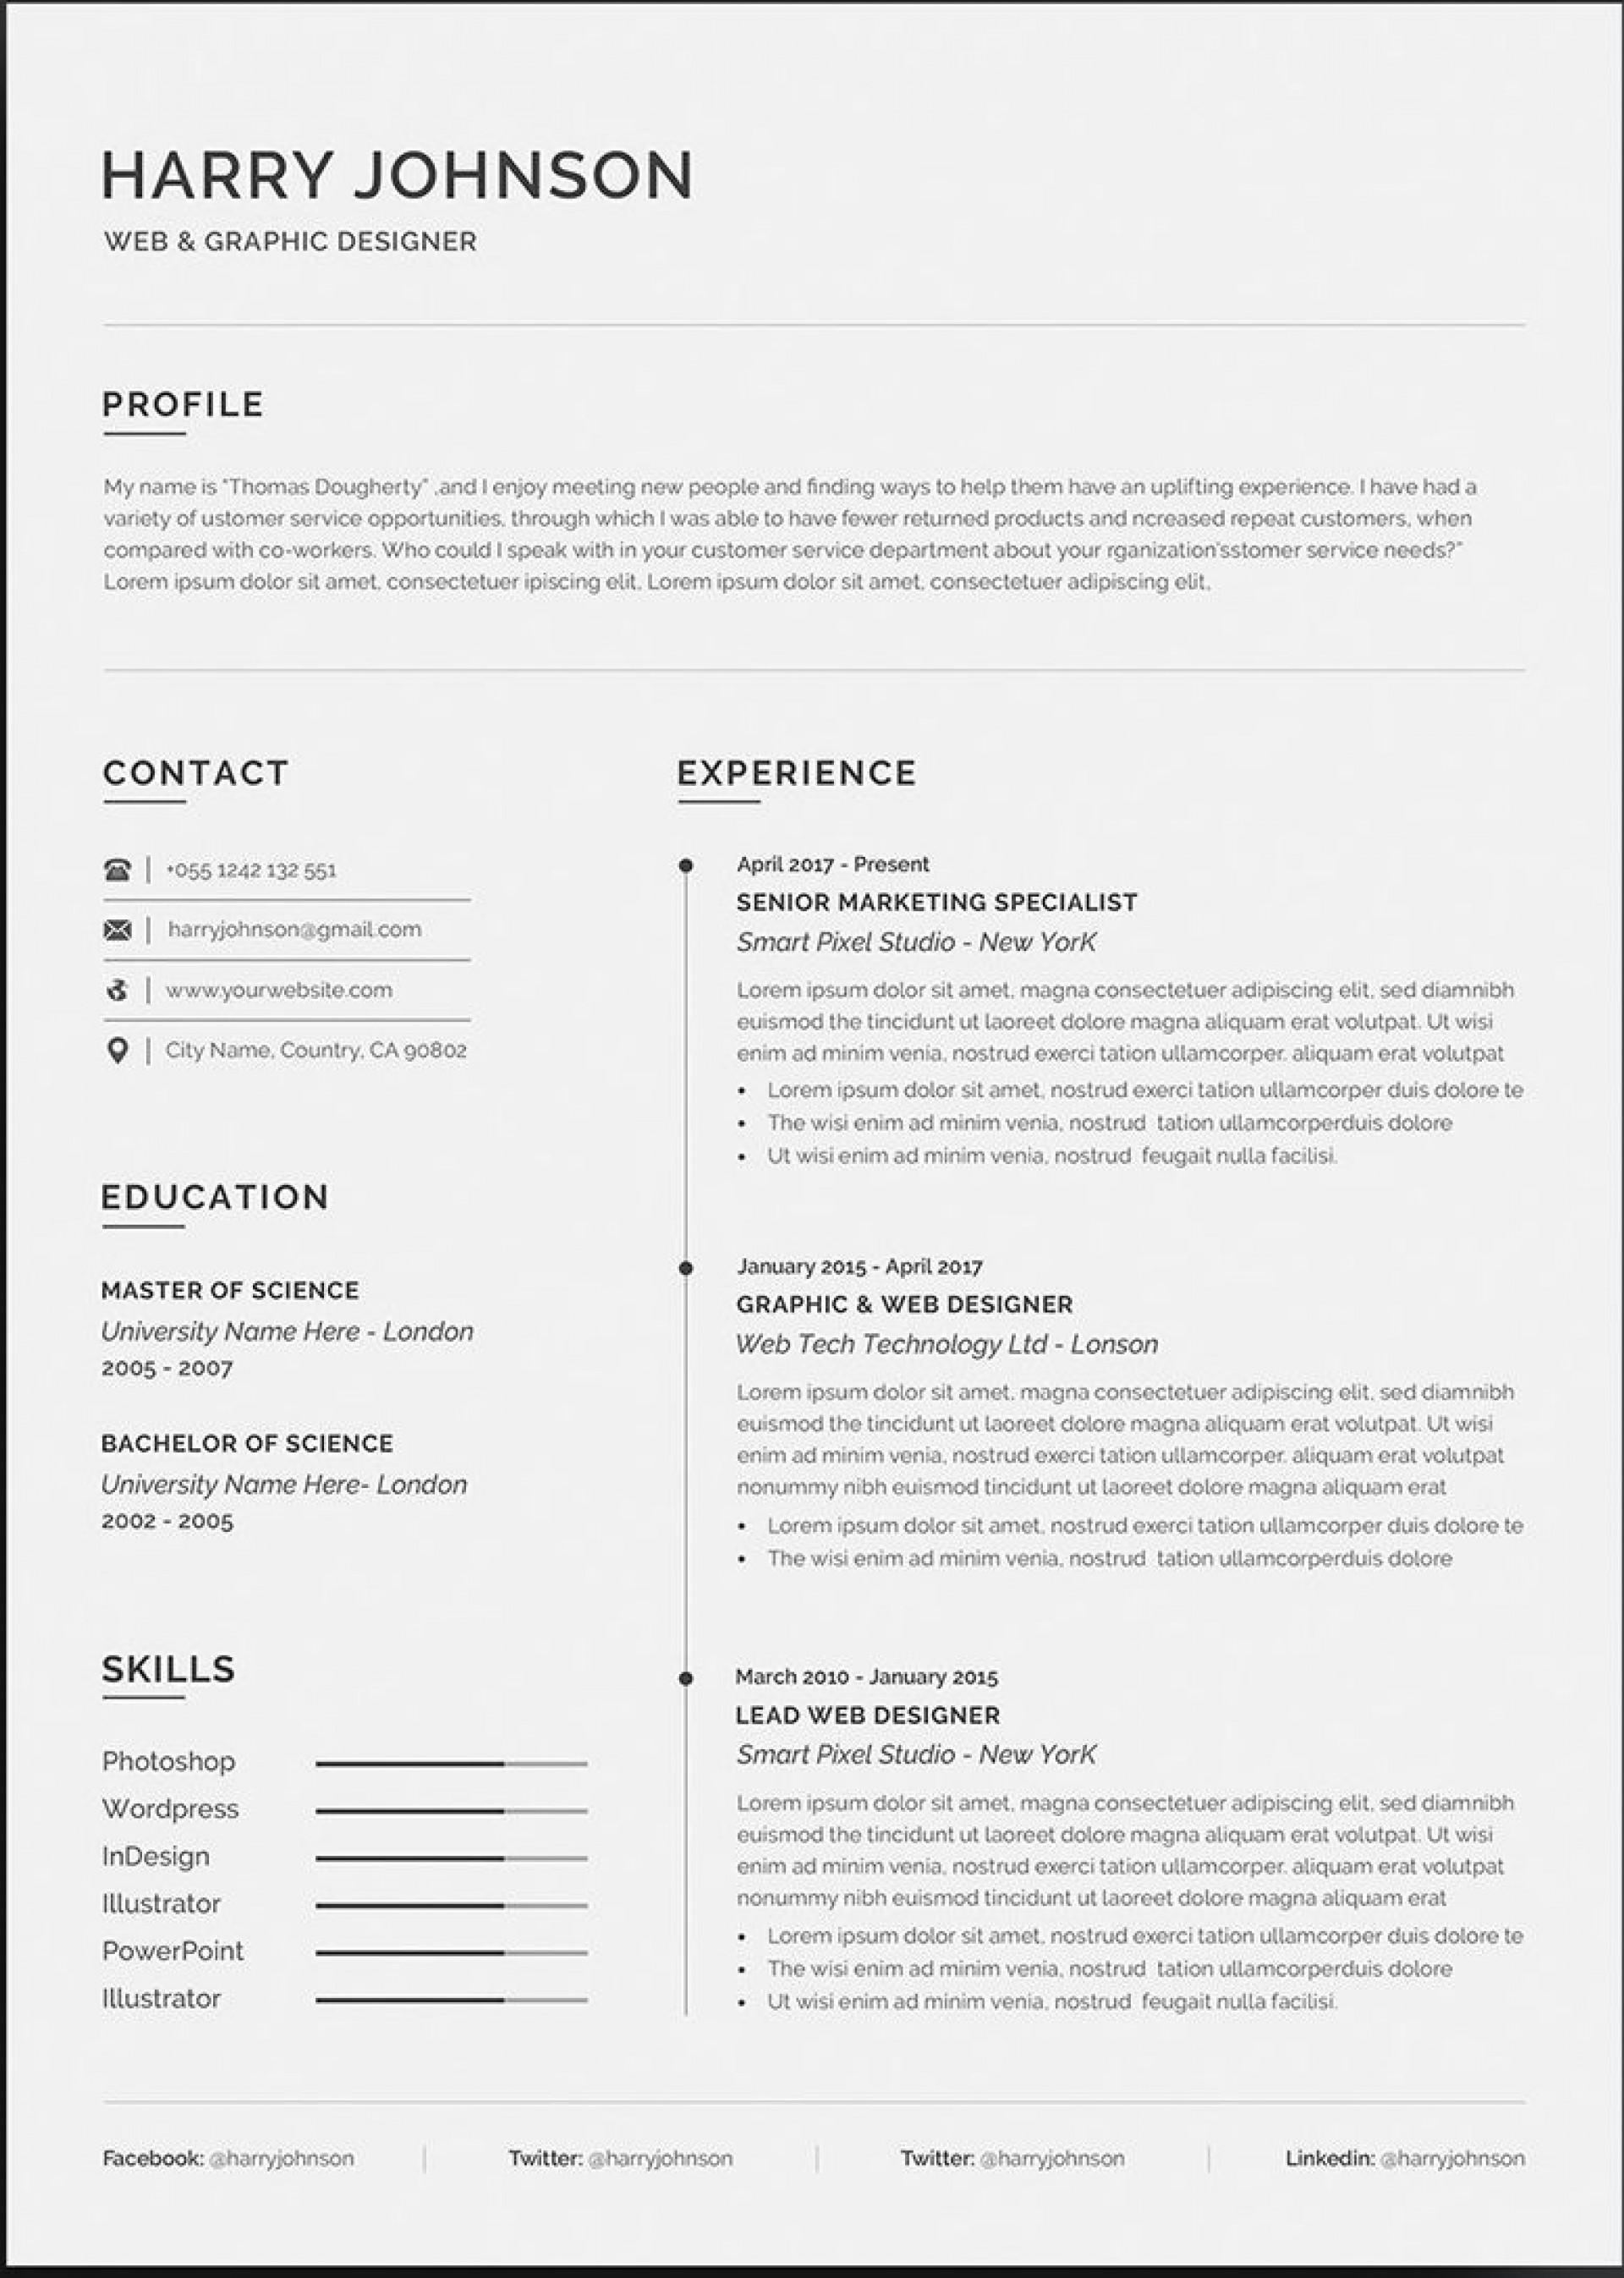 003 Wonderful Resume Microsoft Word Template Image  Cv/resume Design Tutorial With Federal Download1920